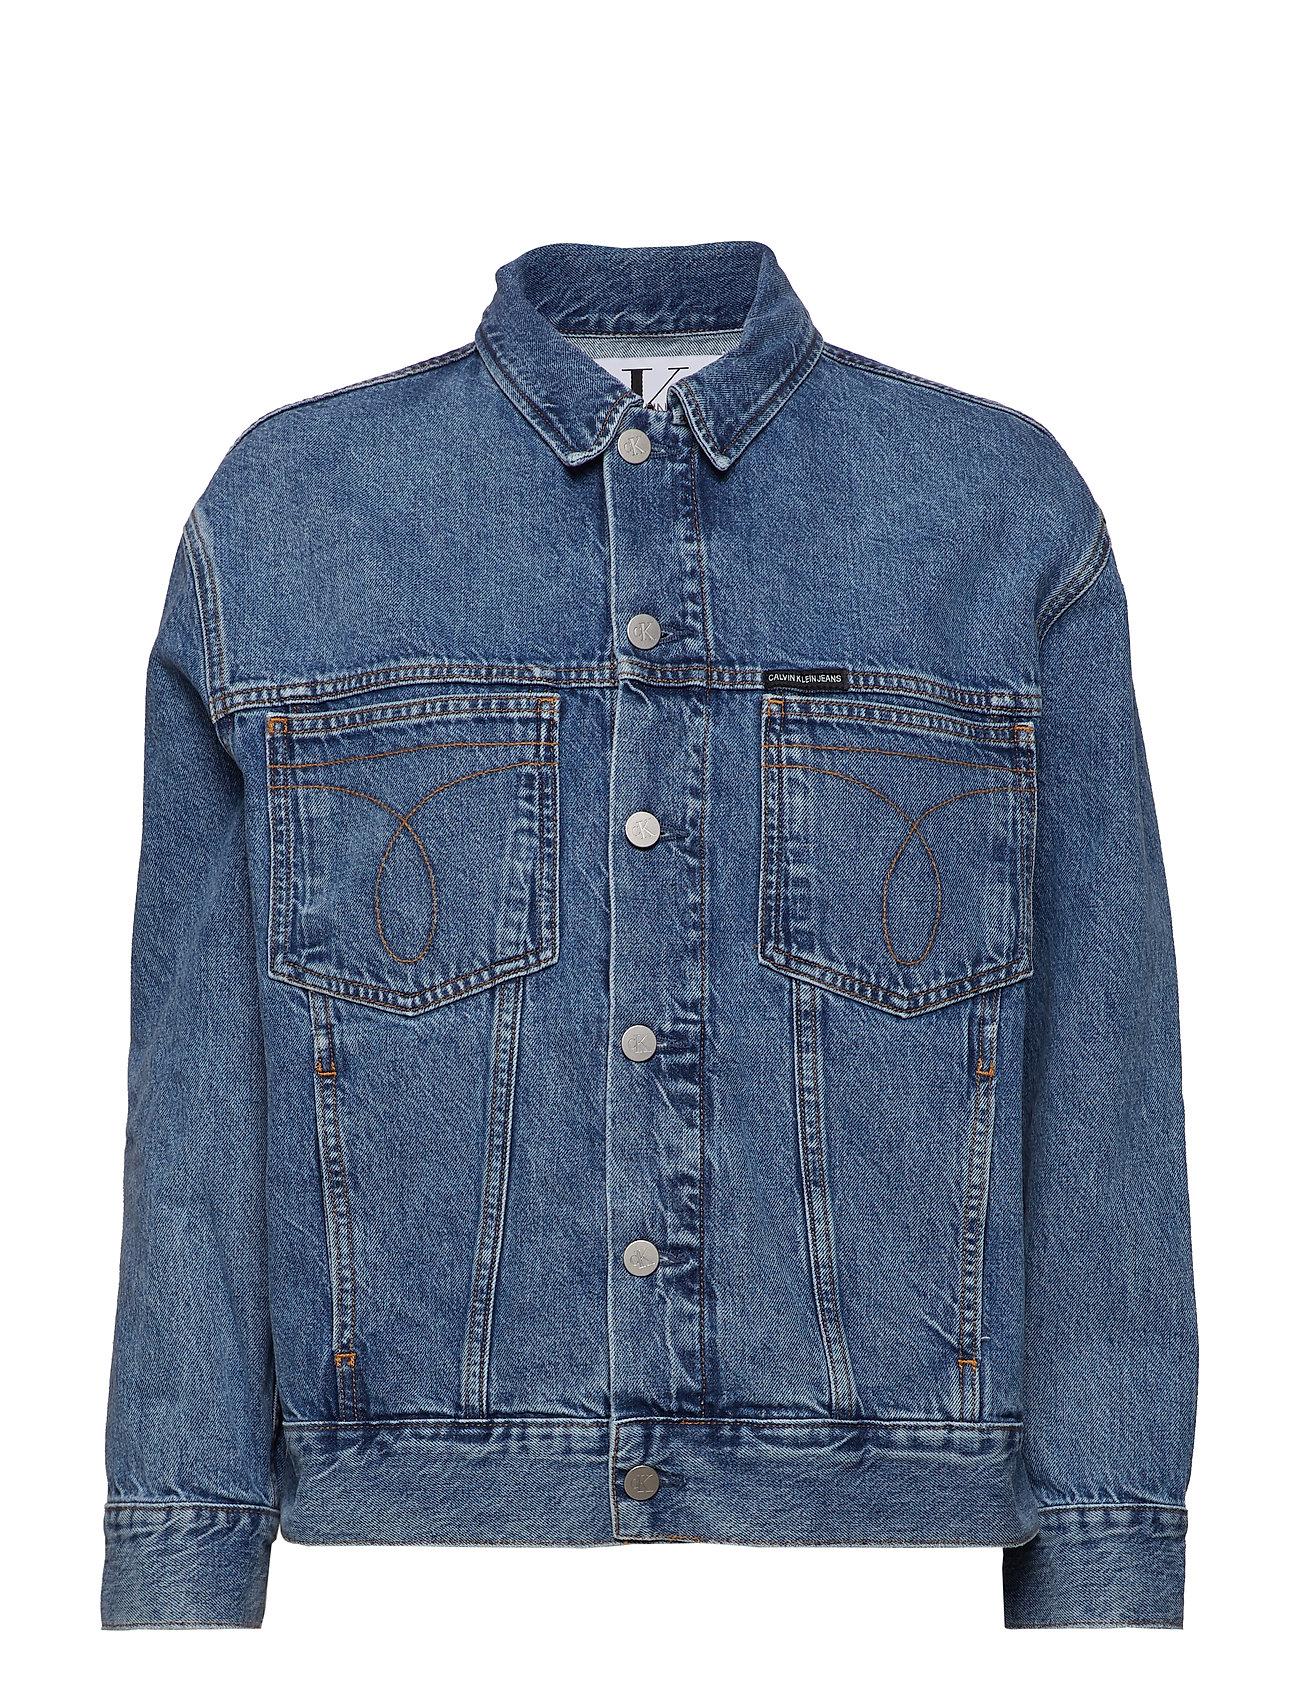 Calvin Klein Jeans OVERSIZED ICONIC OMEGA TRUCKER - ICONIC MID STONE